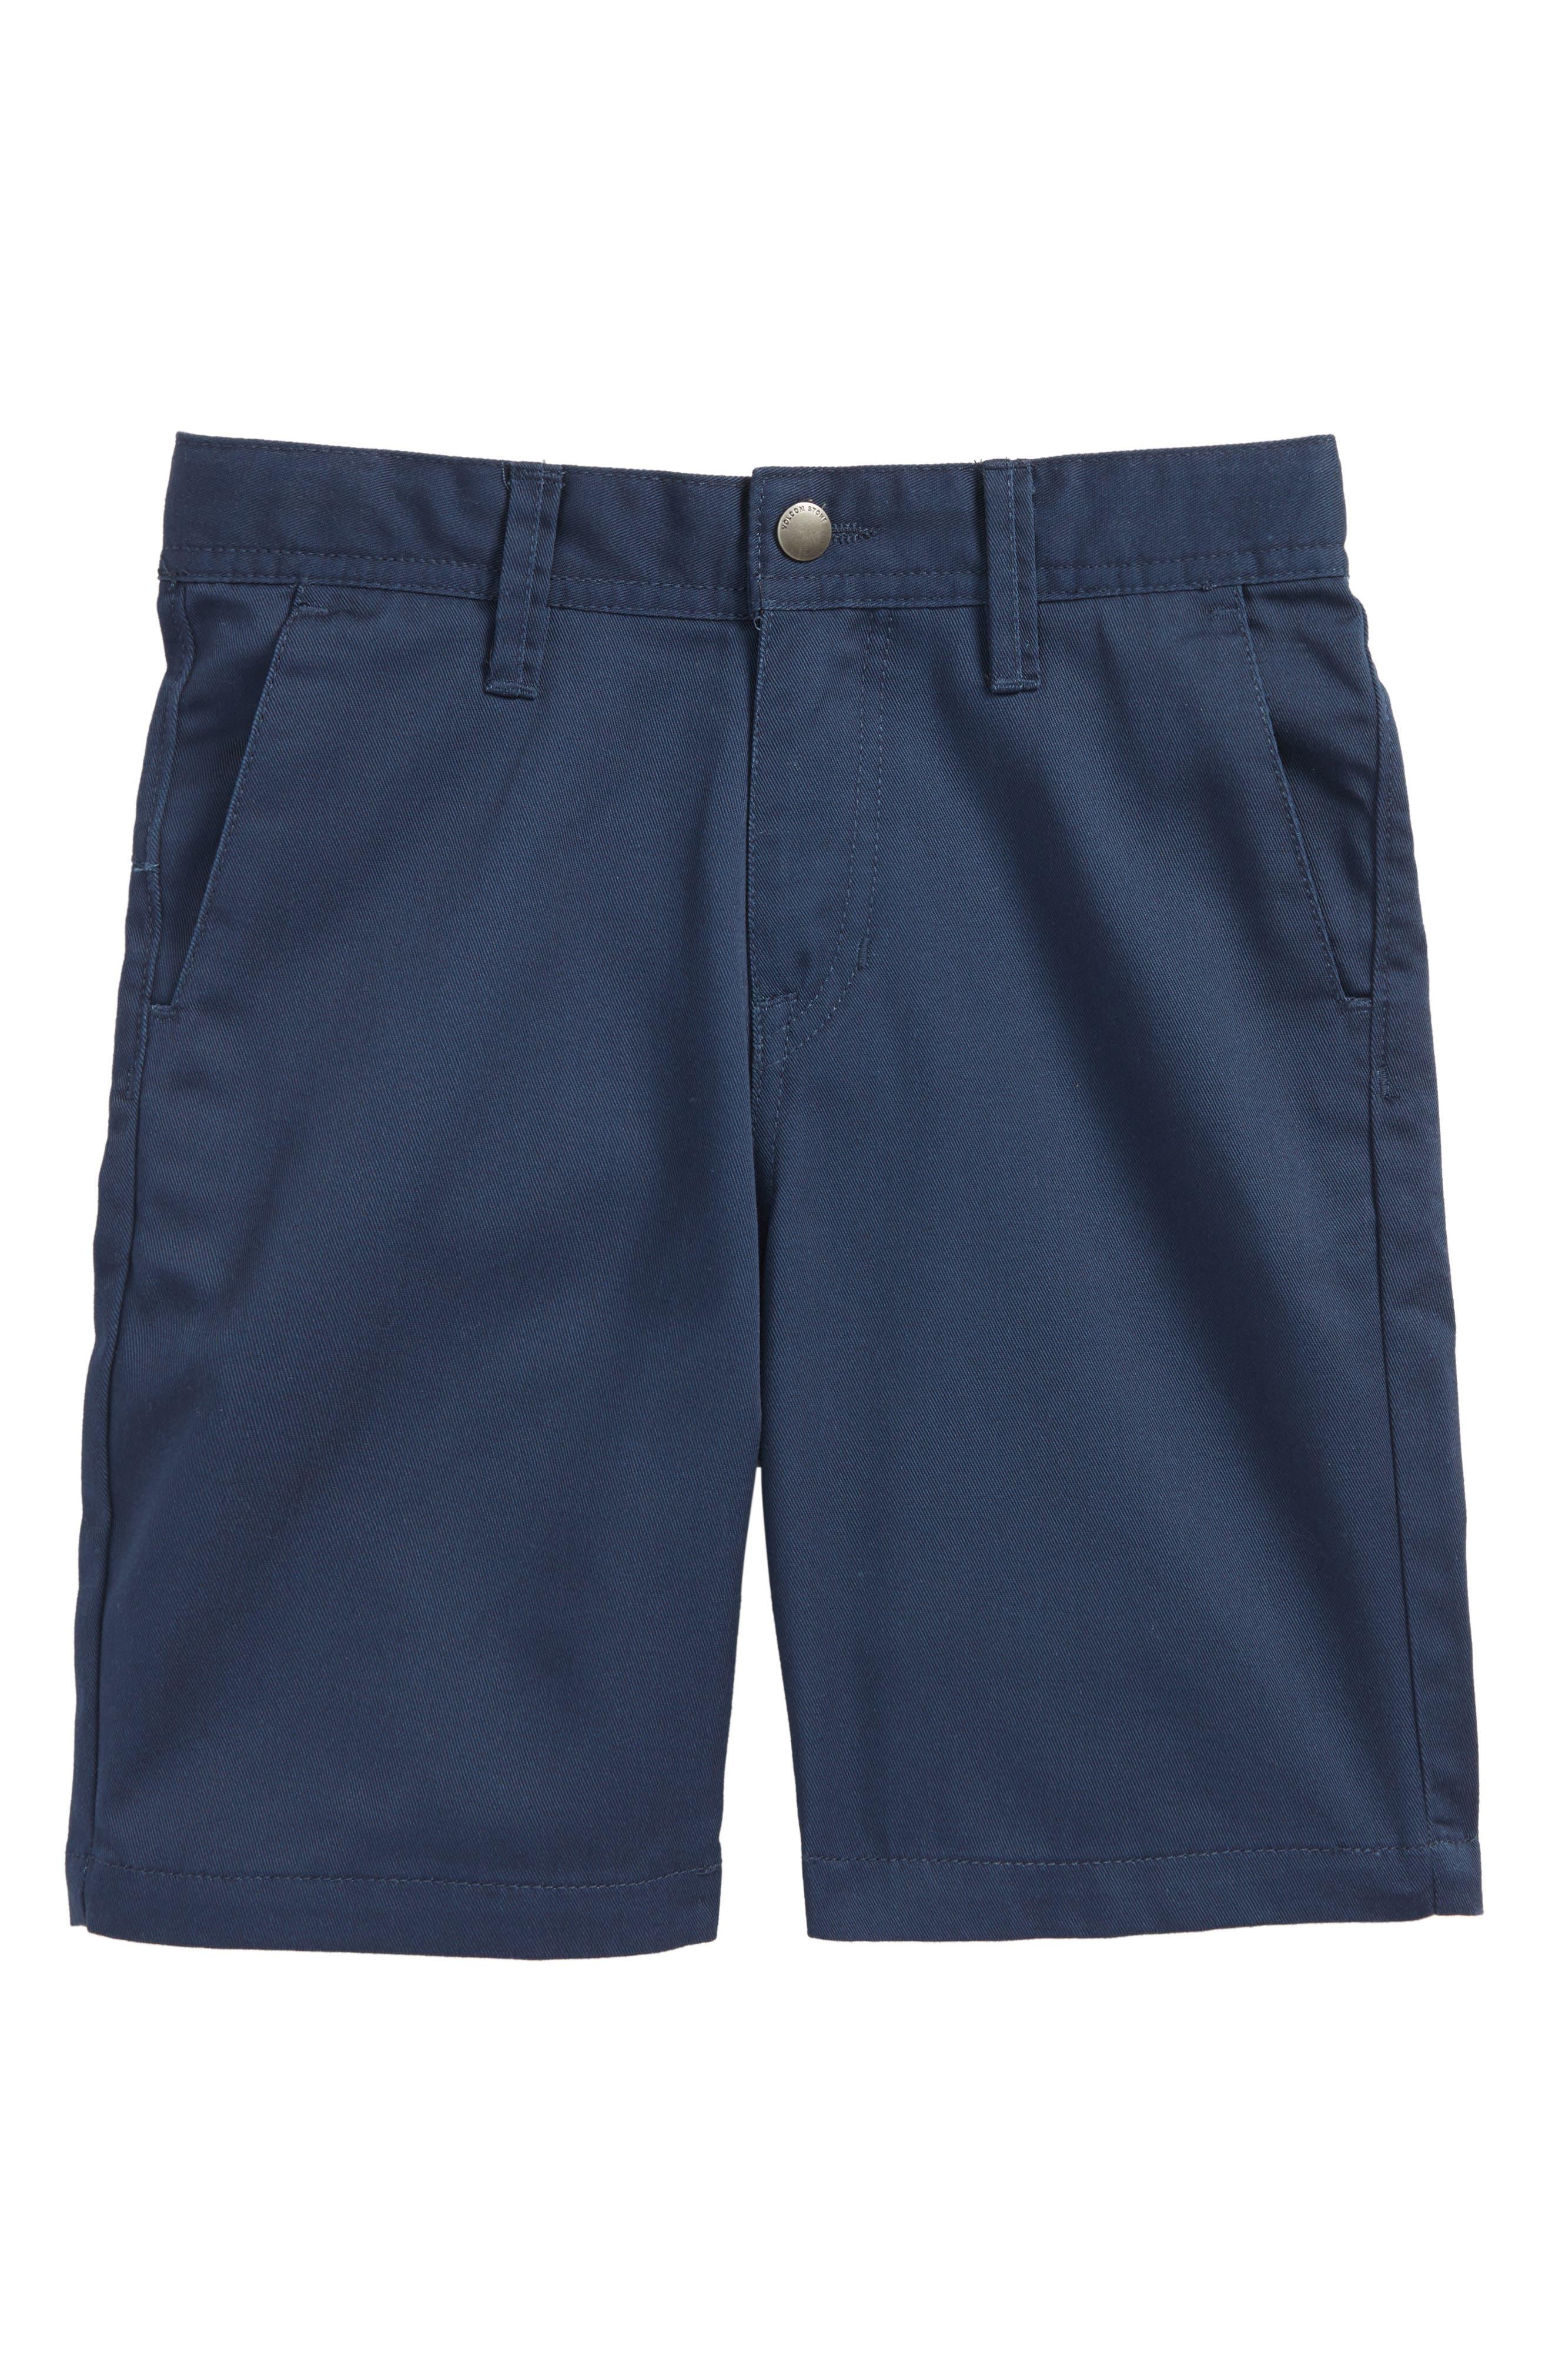 Volcom Chino Shorts (Toddler Boys & Little Boys)